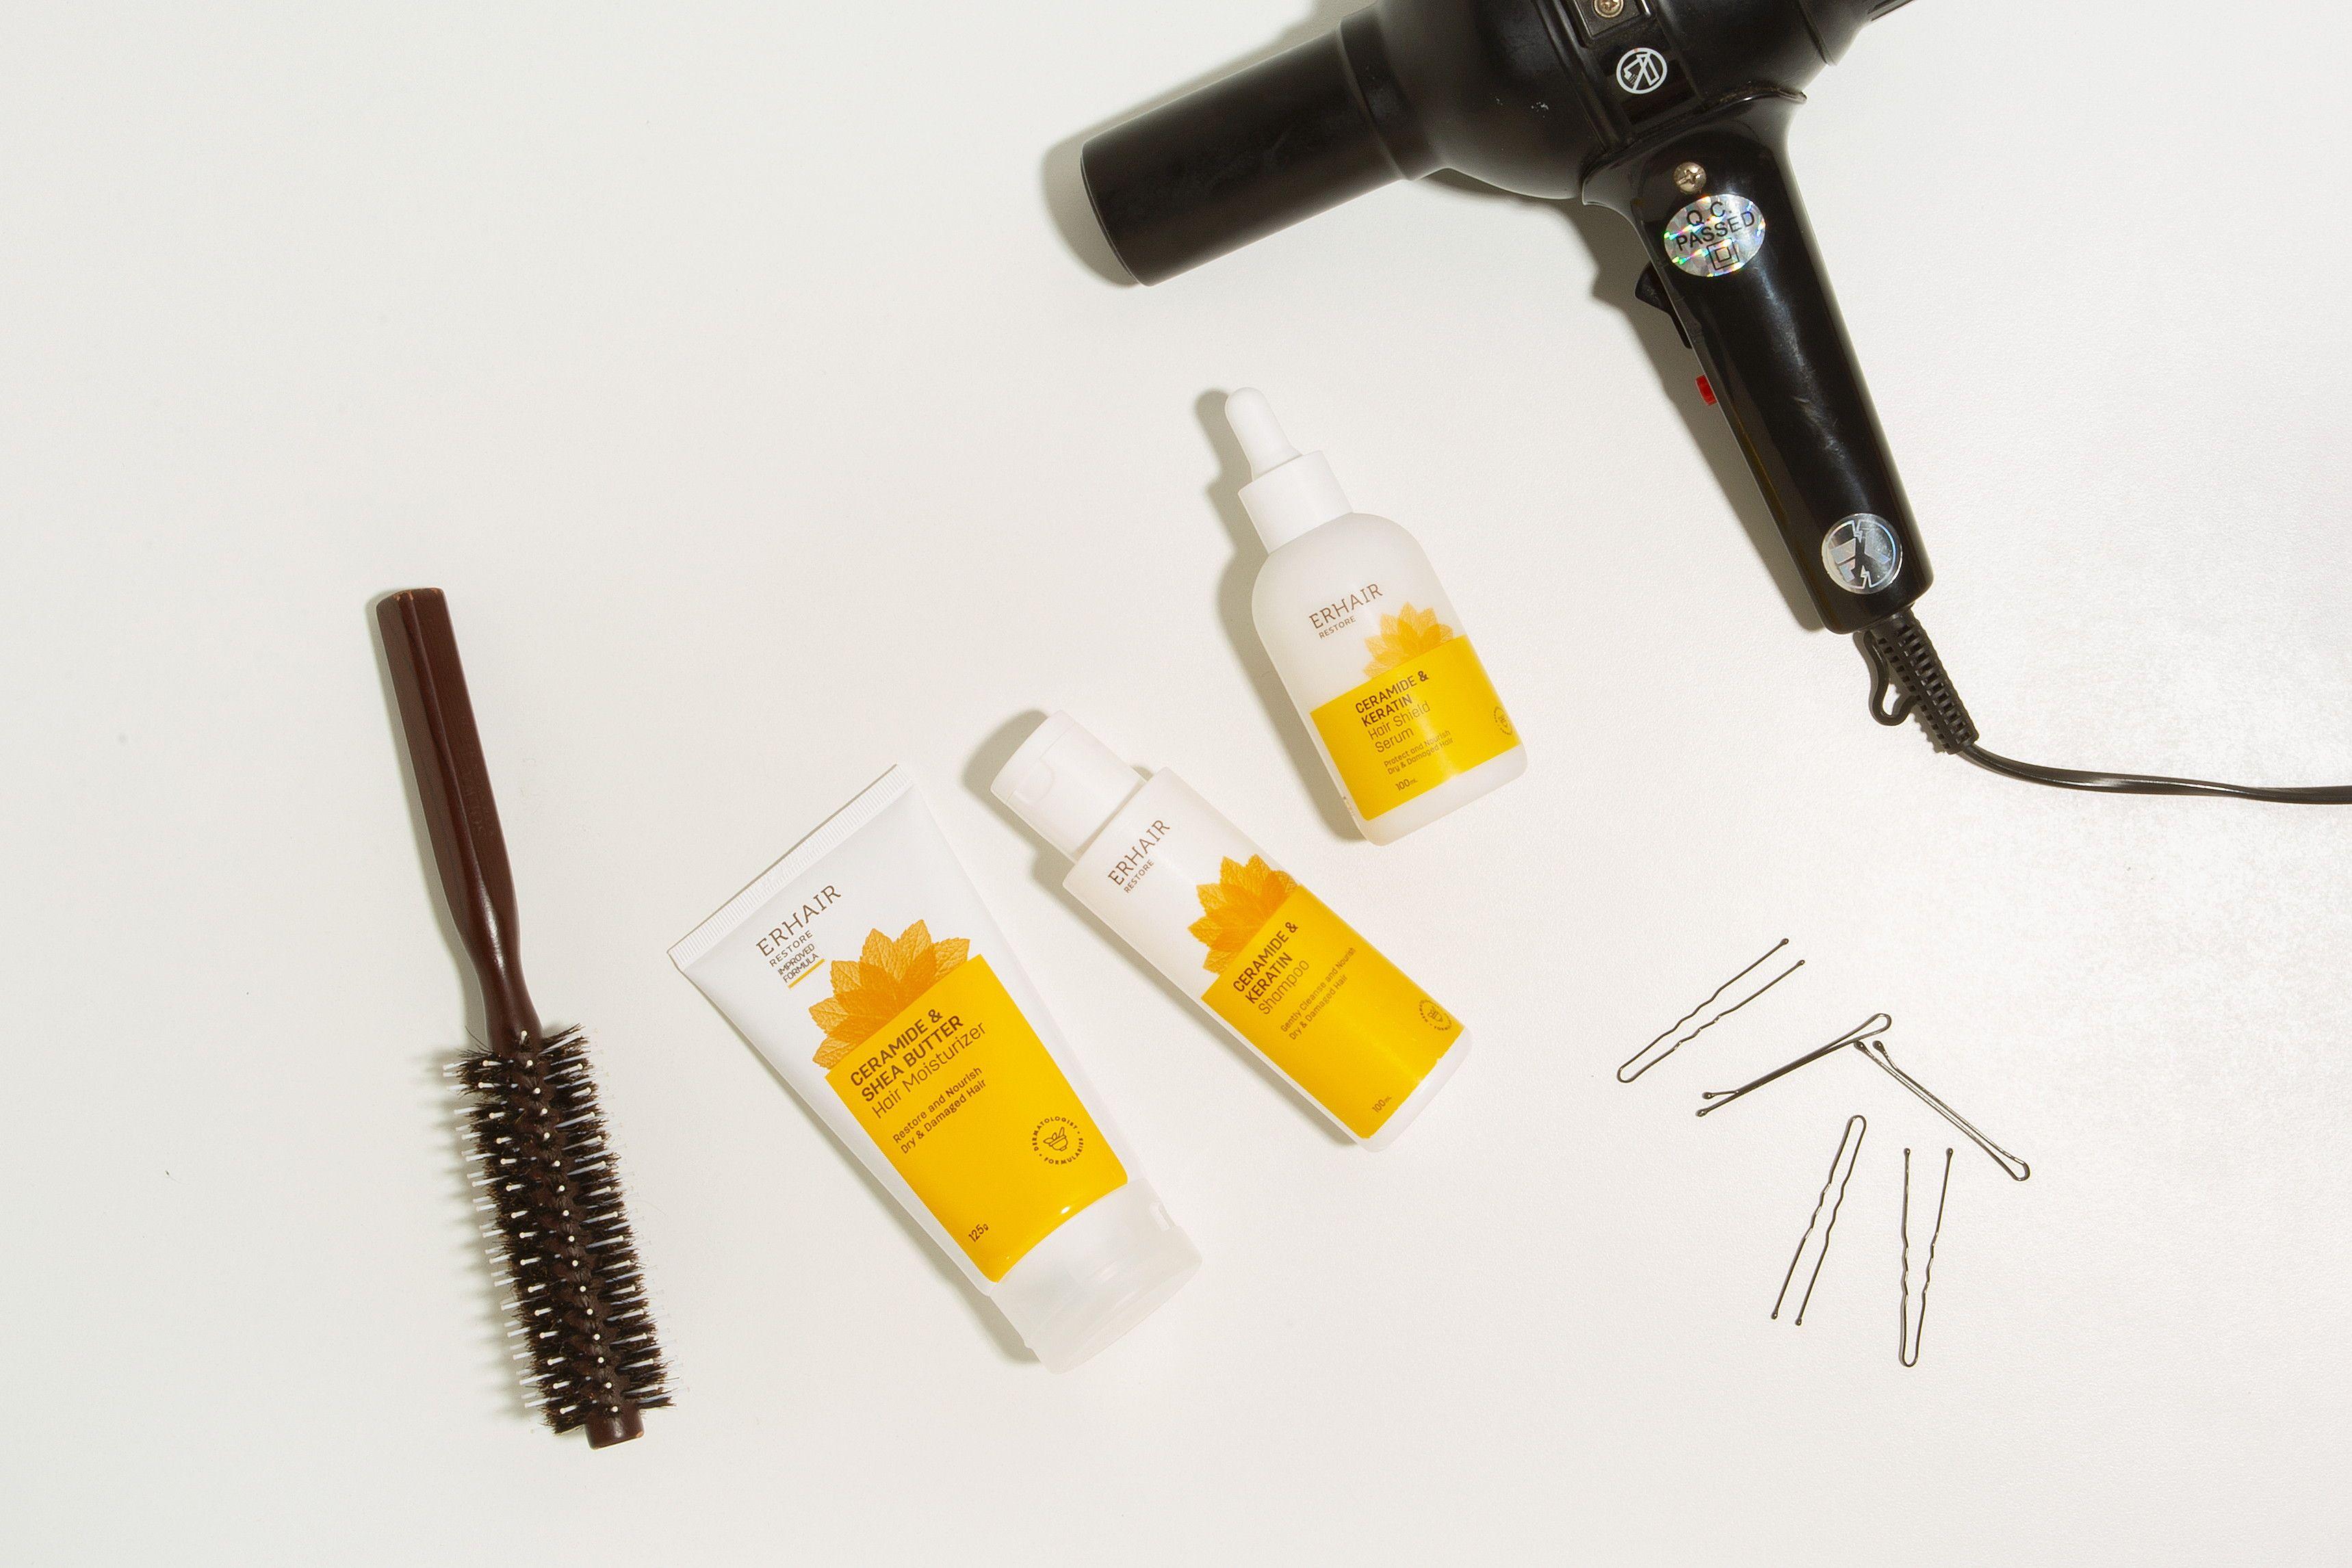 Hair Styling Jadi Kebutuhan, Serum Rambut Anti Panas Wajib Dibutuhkan!